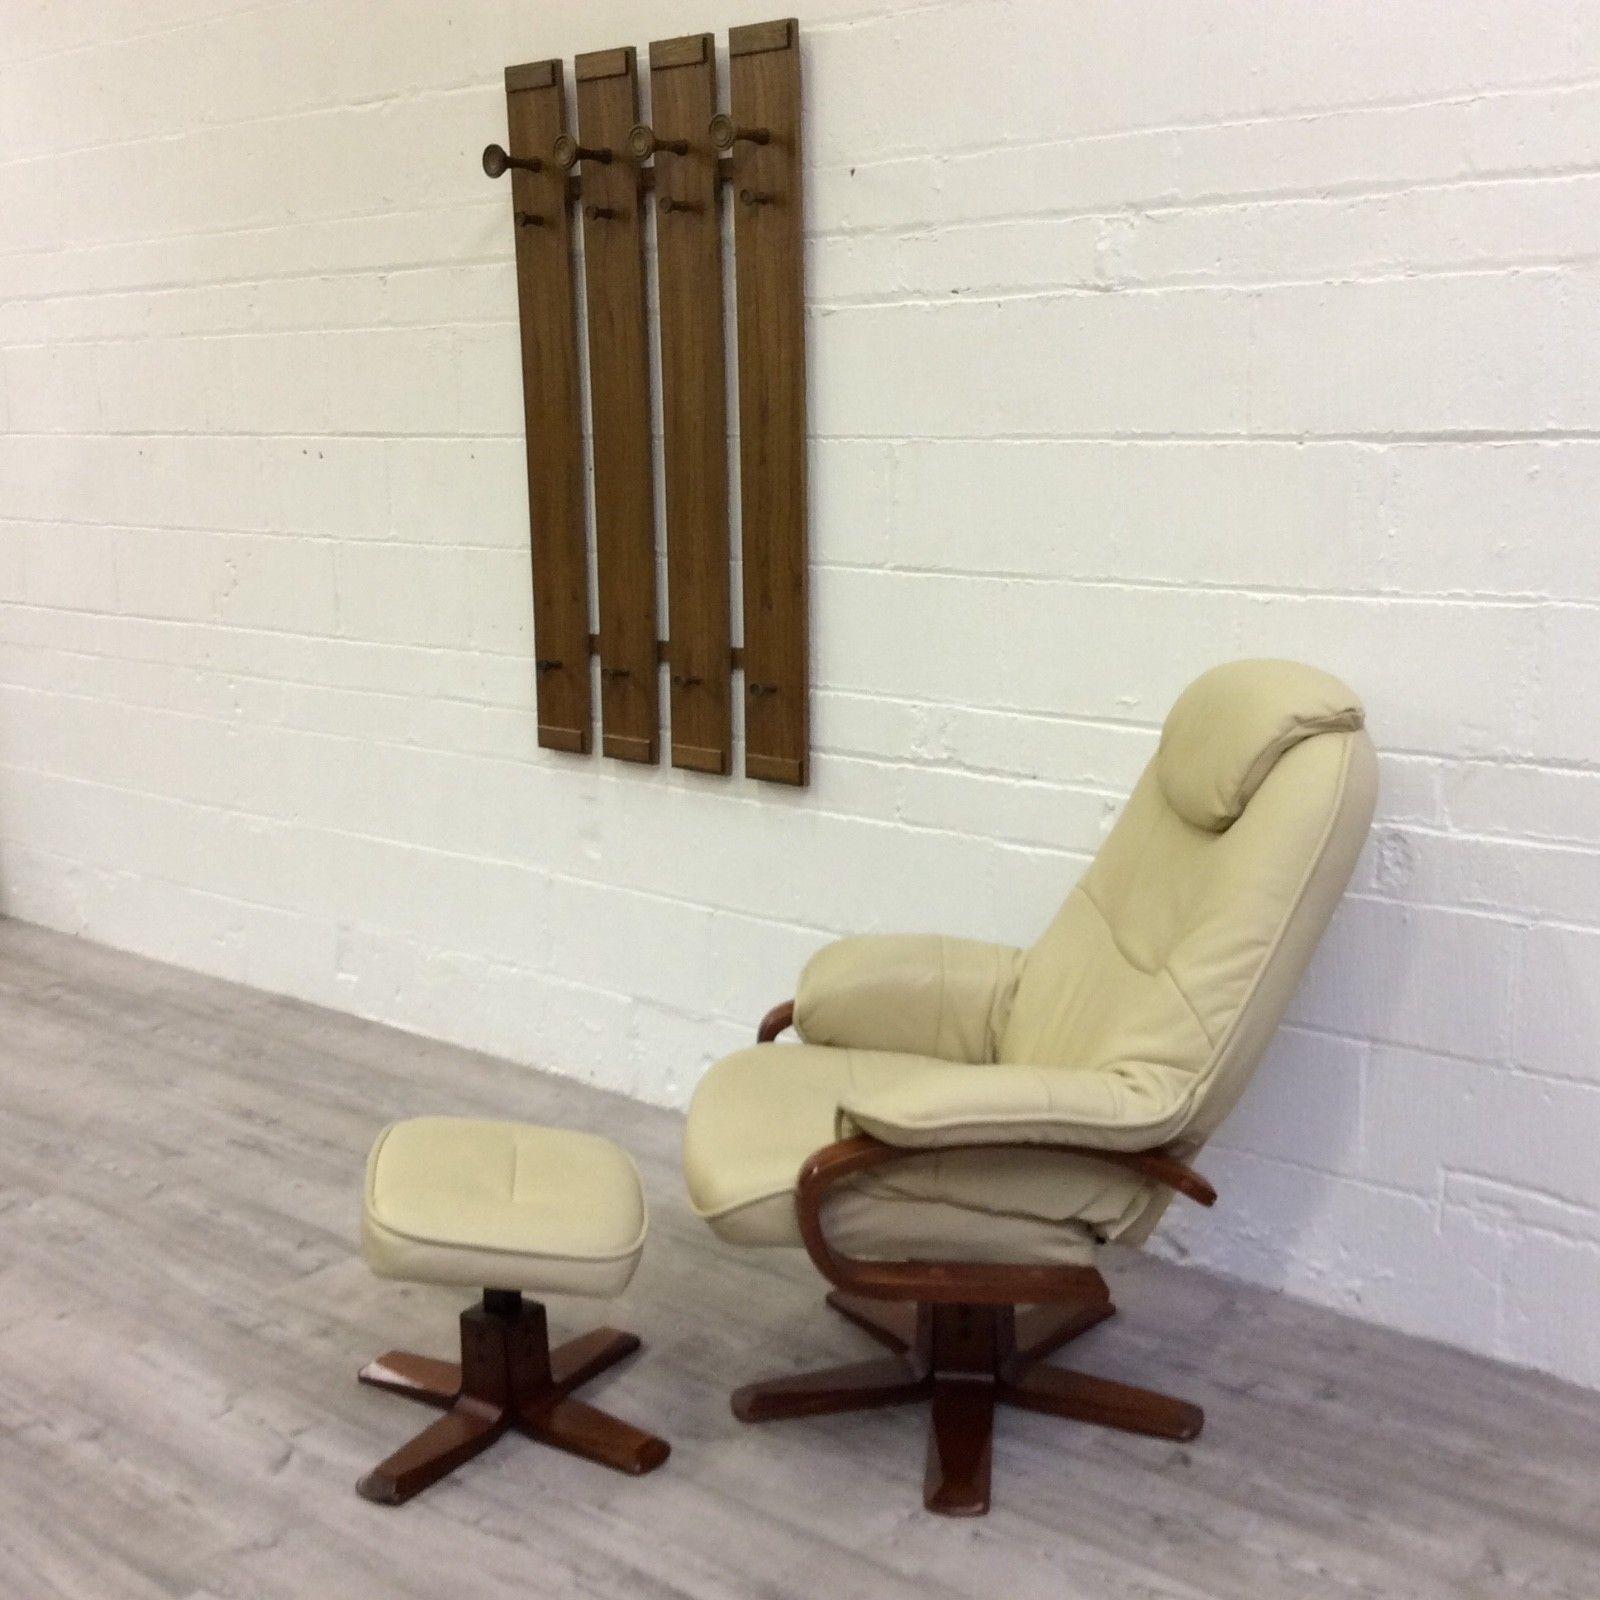 Picture of: Atlanta Luxury Recliner Chair Footstool Cream Leather Swivel Reclining Chair Atlanta Vinterior